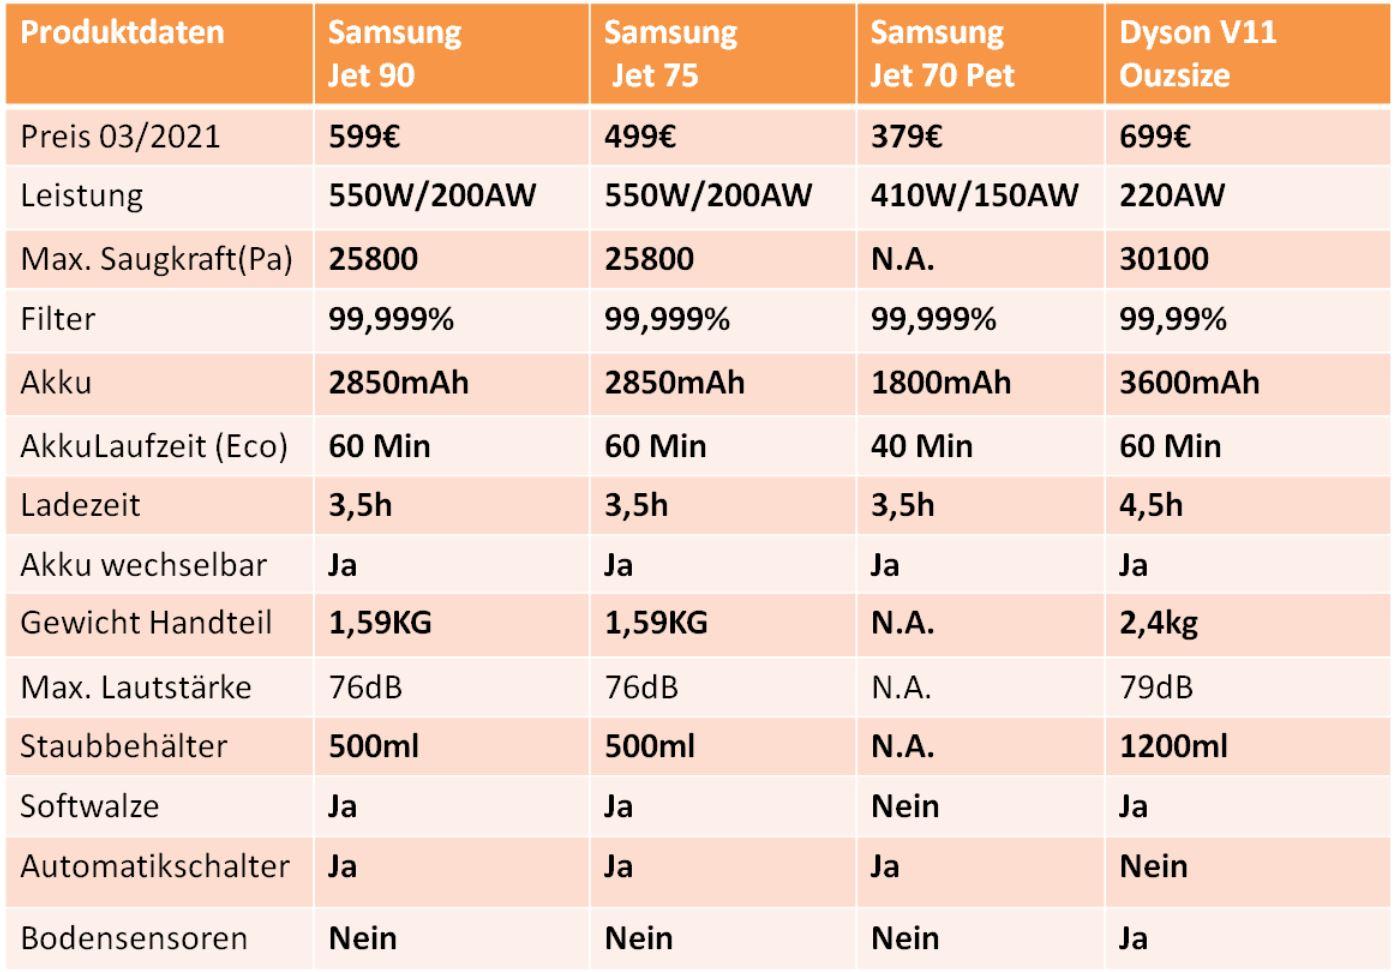 Samsung Jet 90 Akkusauger Dyson V11 Outsize technische Daten